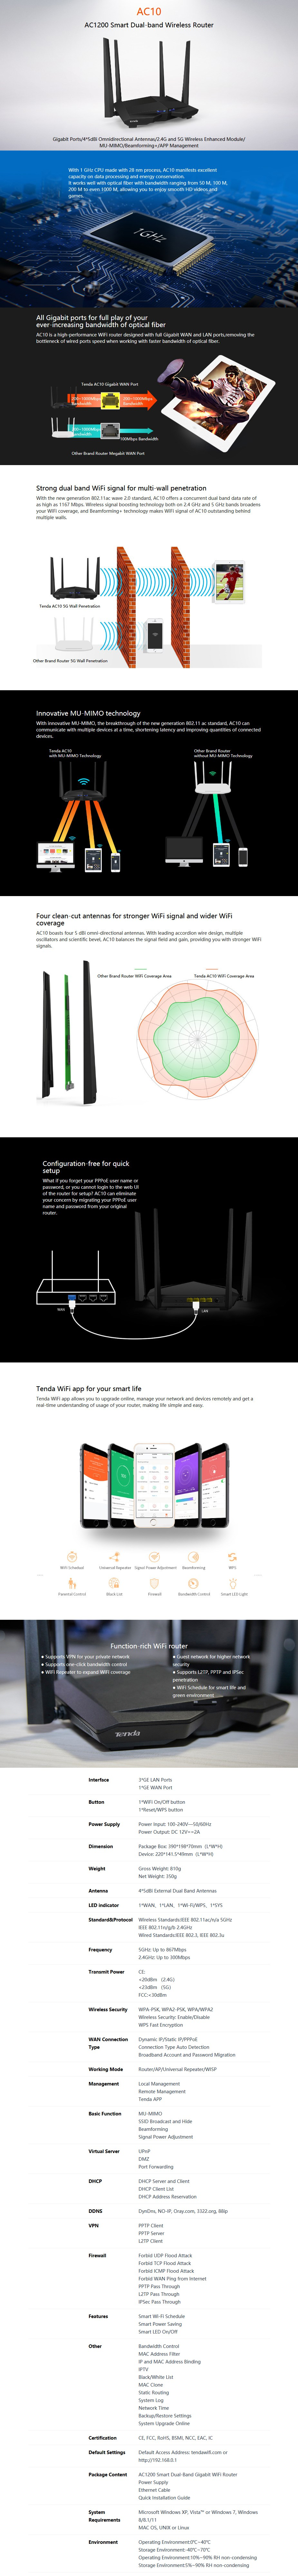 tenda-ac10-ac1200-smart-dualband-gigabit-wifi-router-ac40156-5.jpg